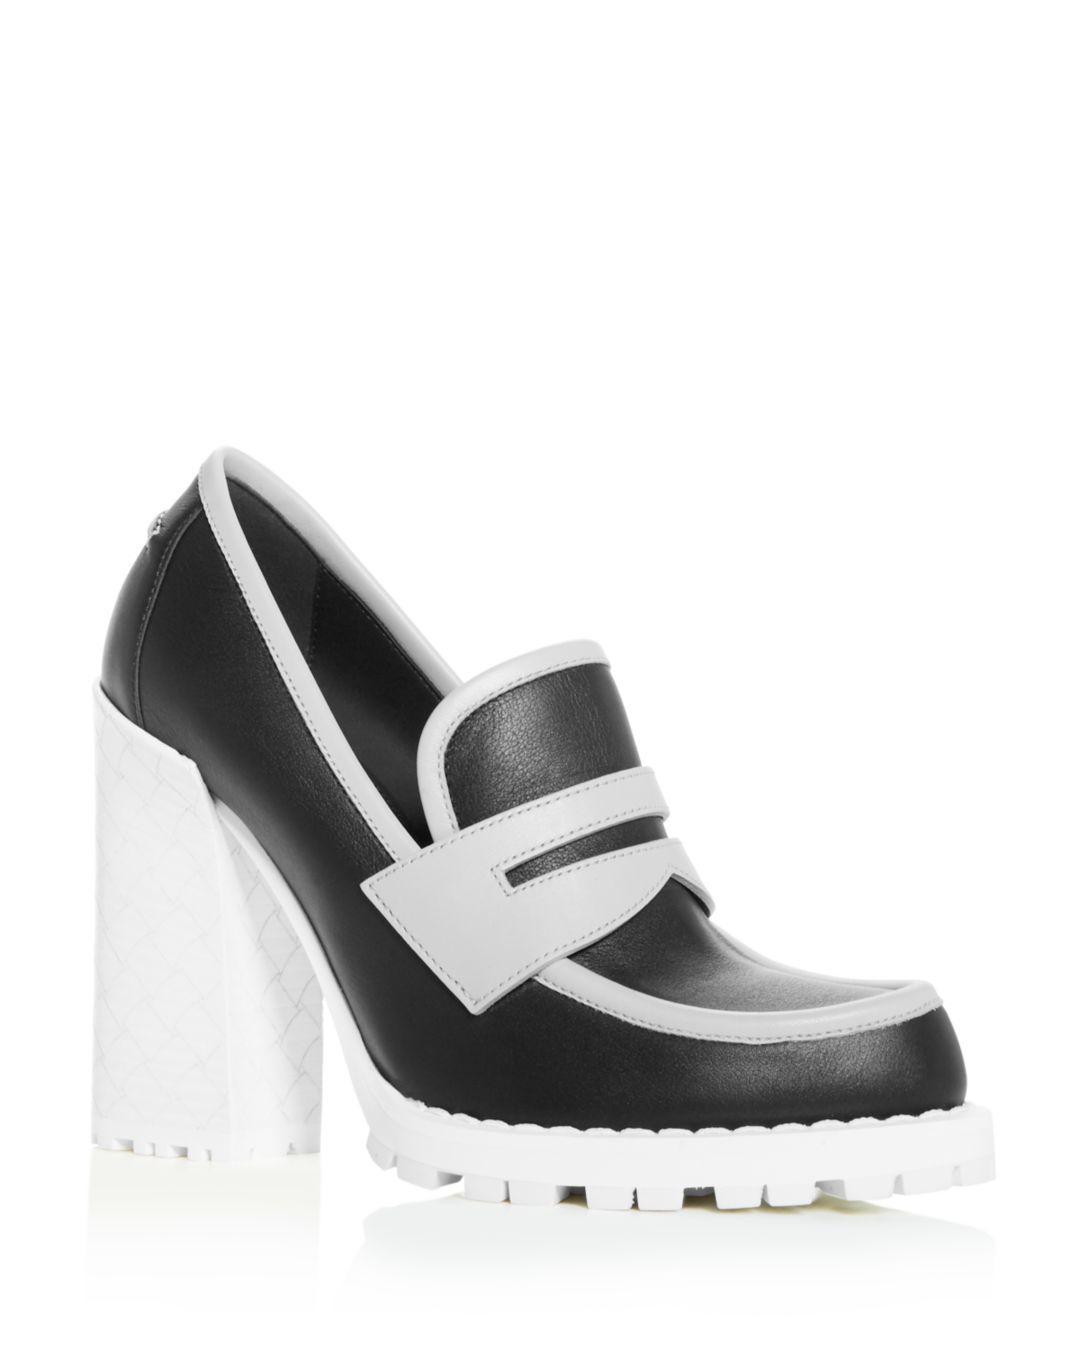 cccff32cecc Bottega Veneta Women s High Block-heel Loafers - Lyst